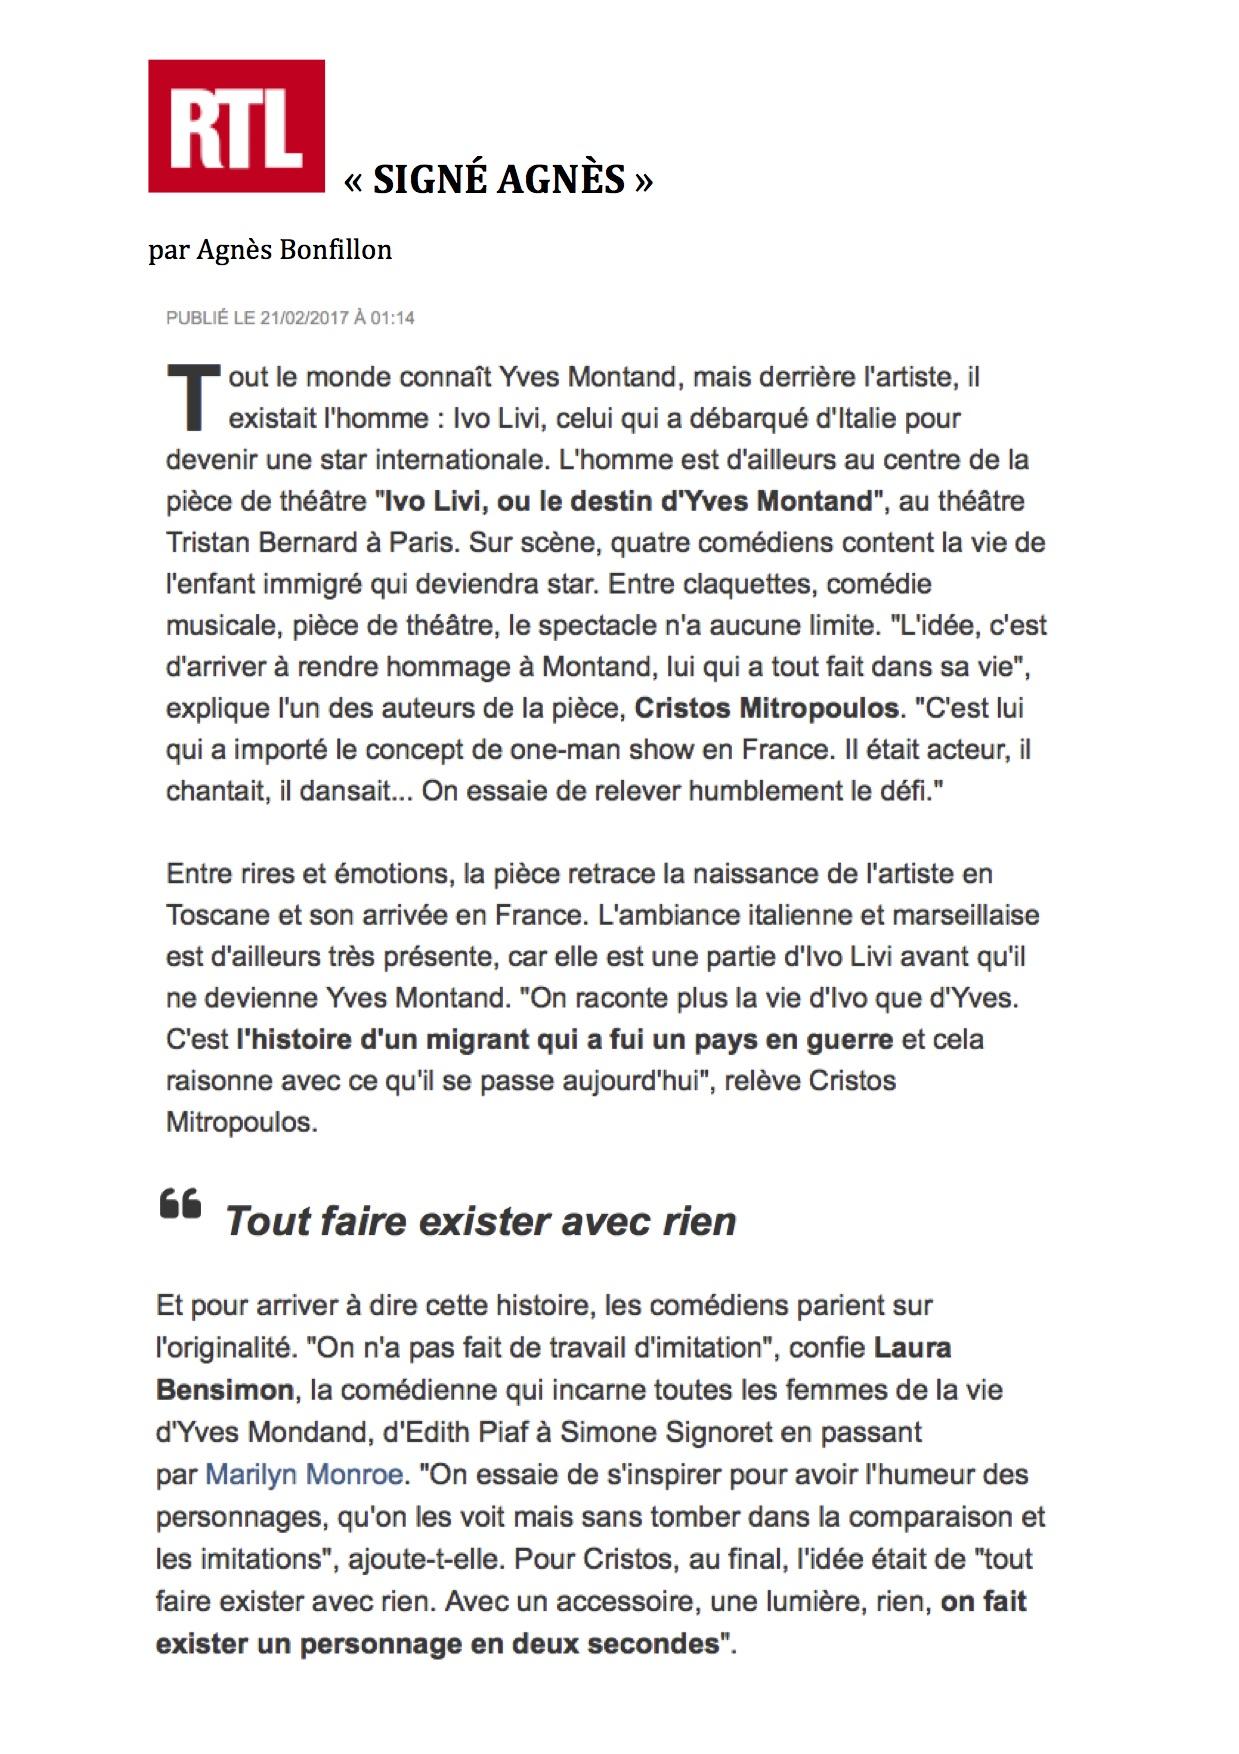 SIGNÉ AGNÈS - RTL 20.02.17